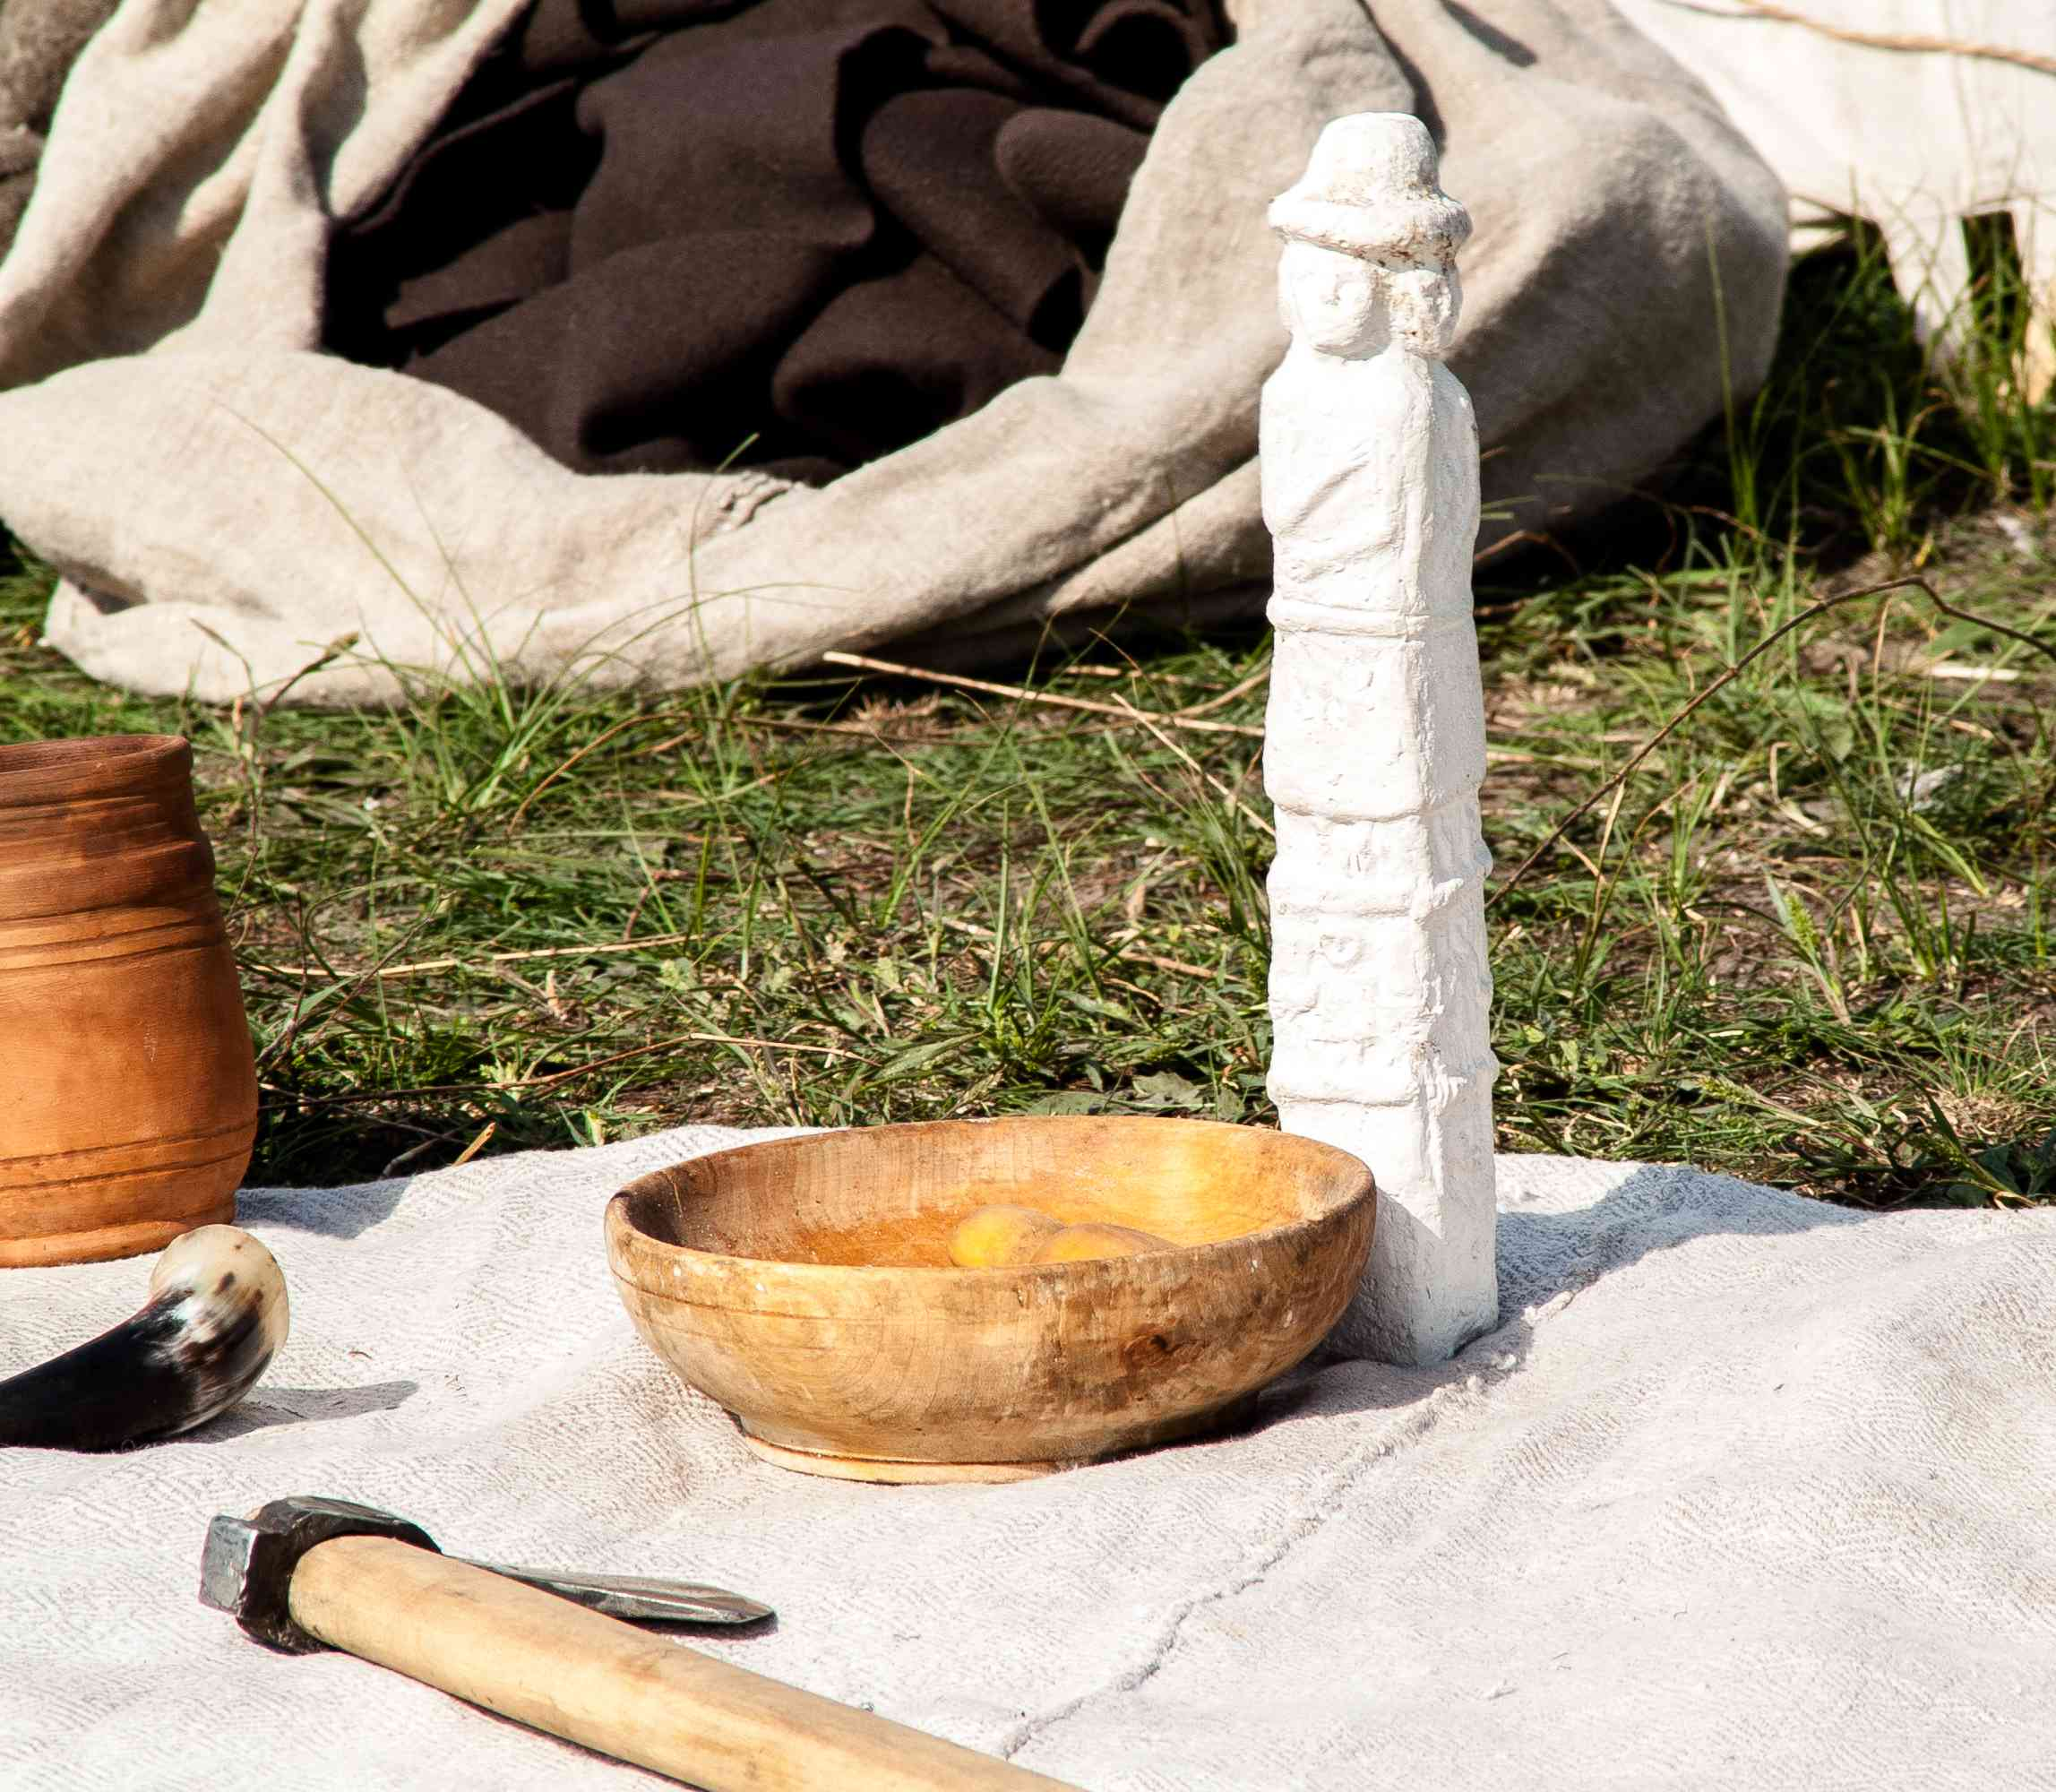 Slavic pagan god made of wood cutting